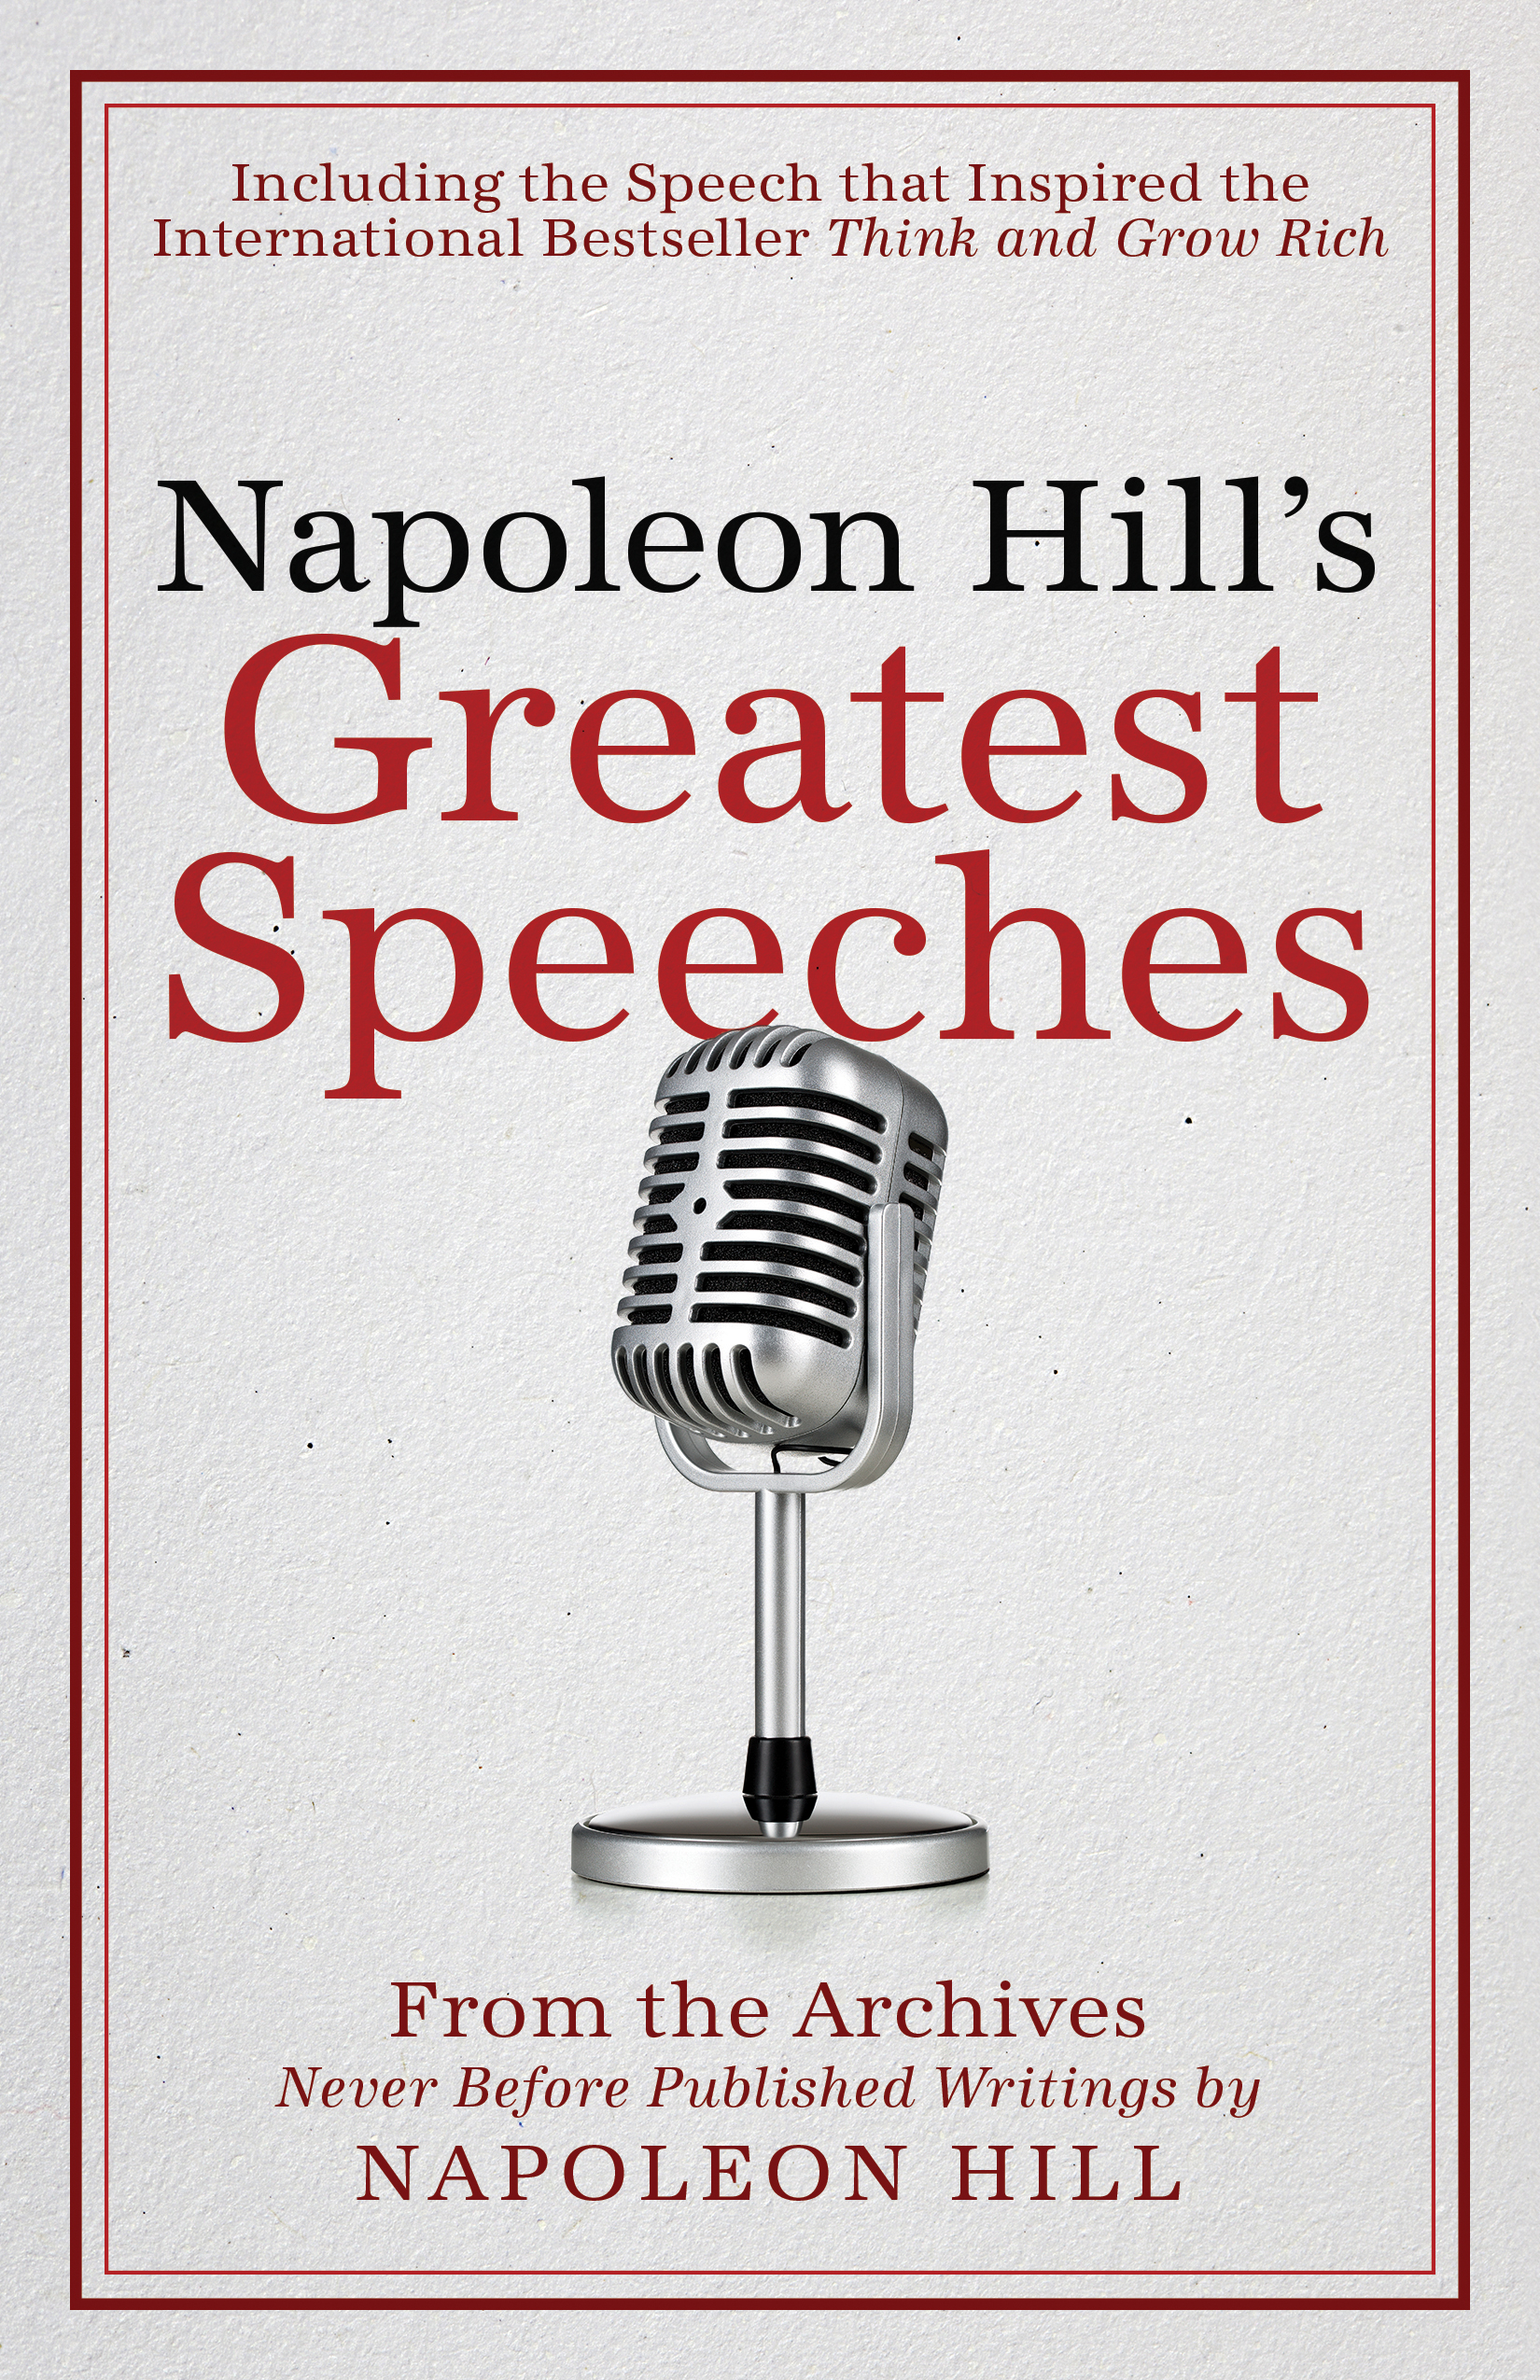 Napoleon Hill's Greatest Speeches - By napoleon hill